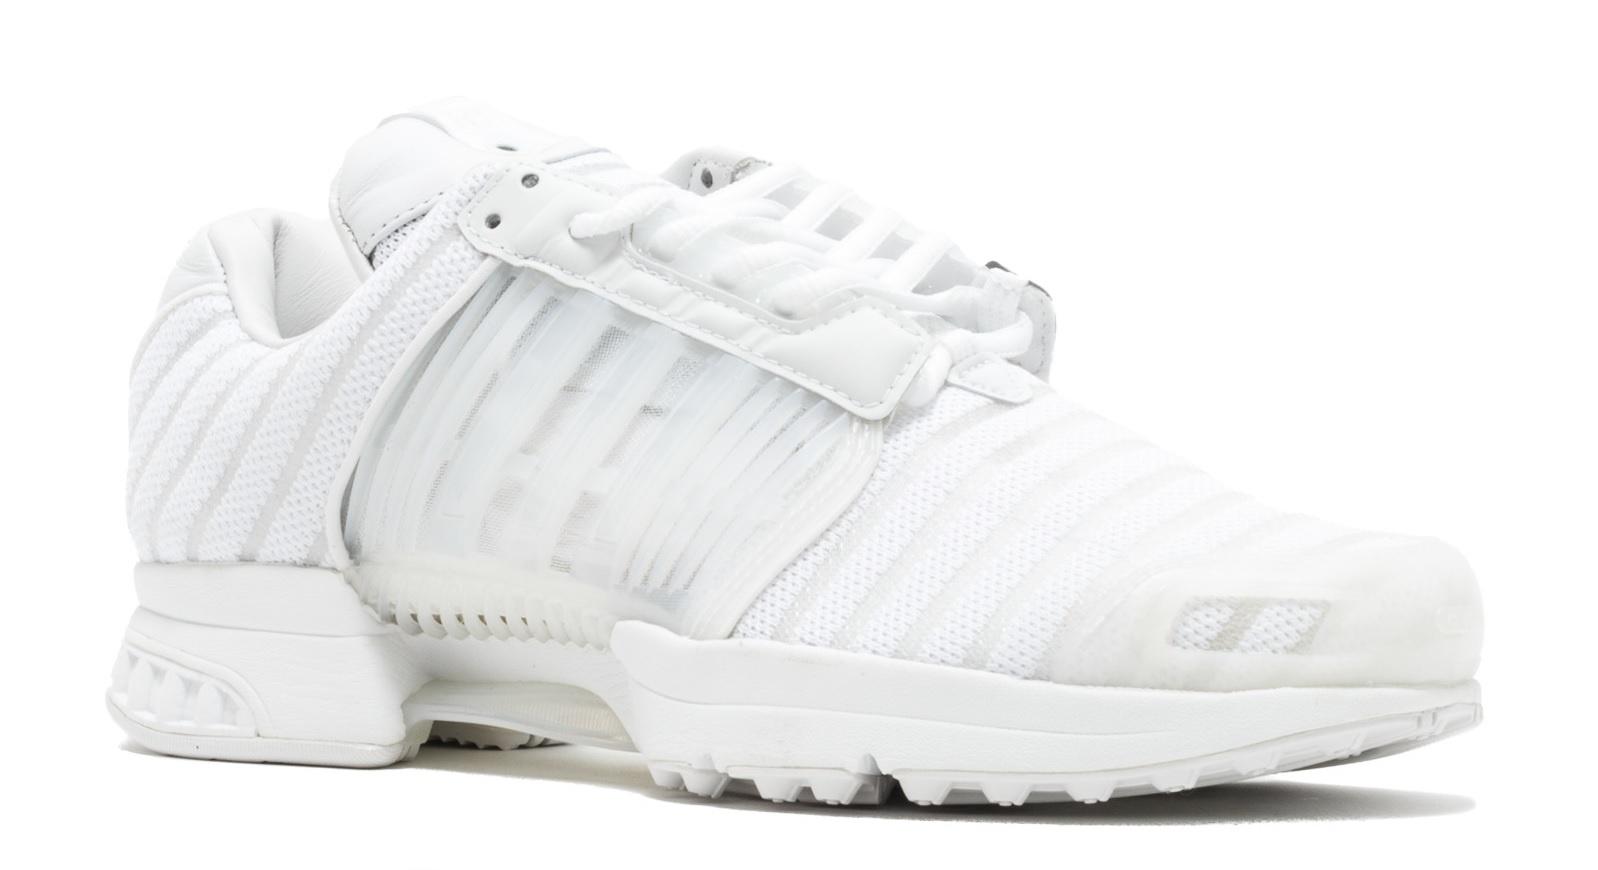 adidas Climacool 1 shoes white